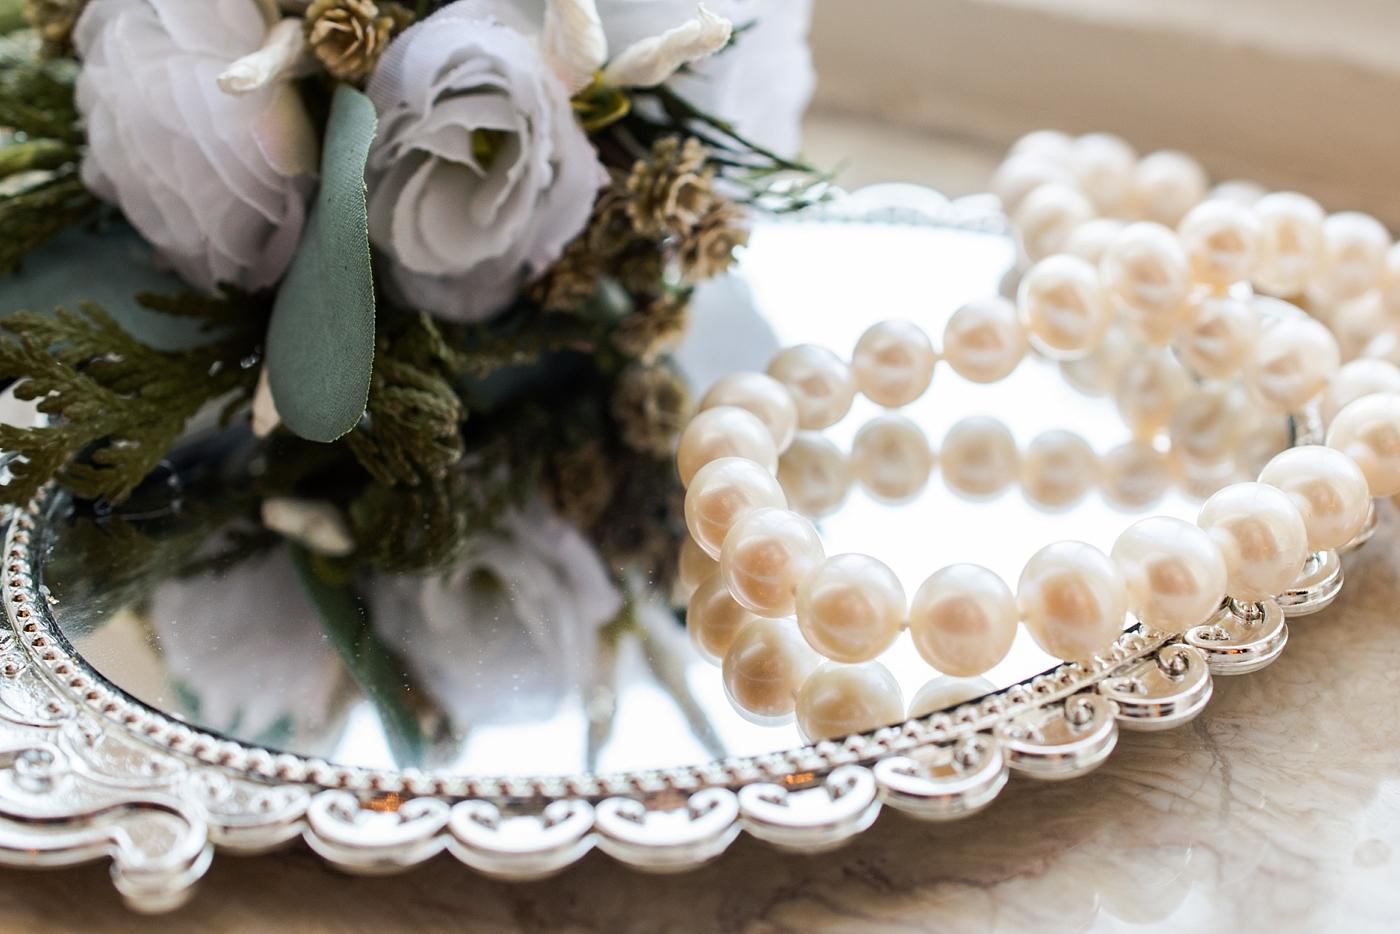 indianapolis-top-rated-wedding-photographers_0400.jpg